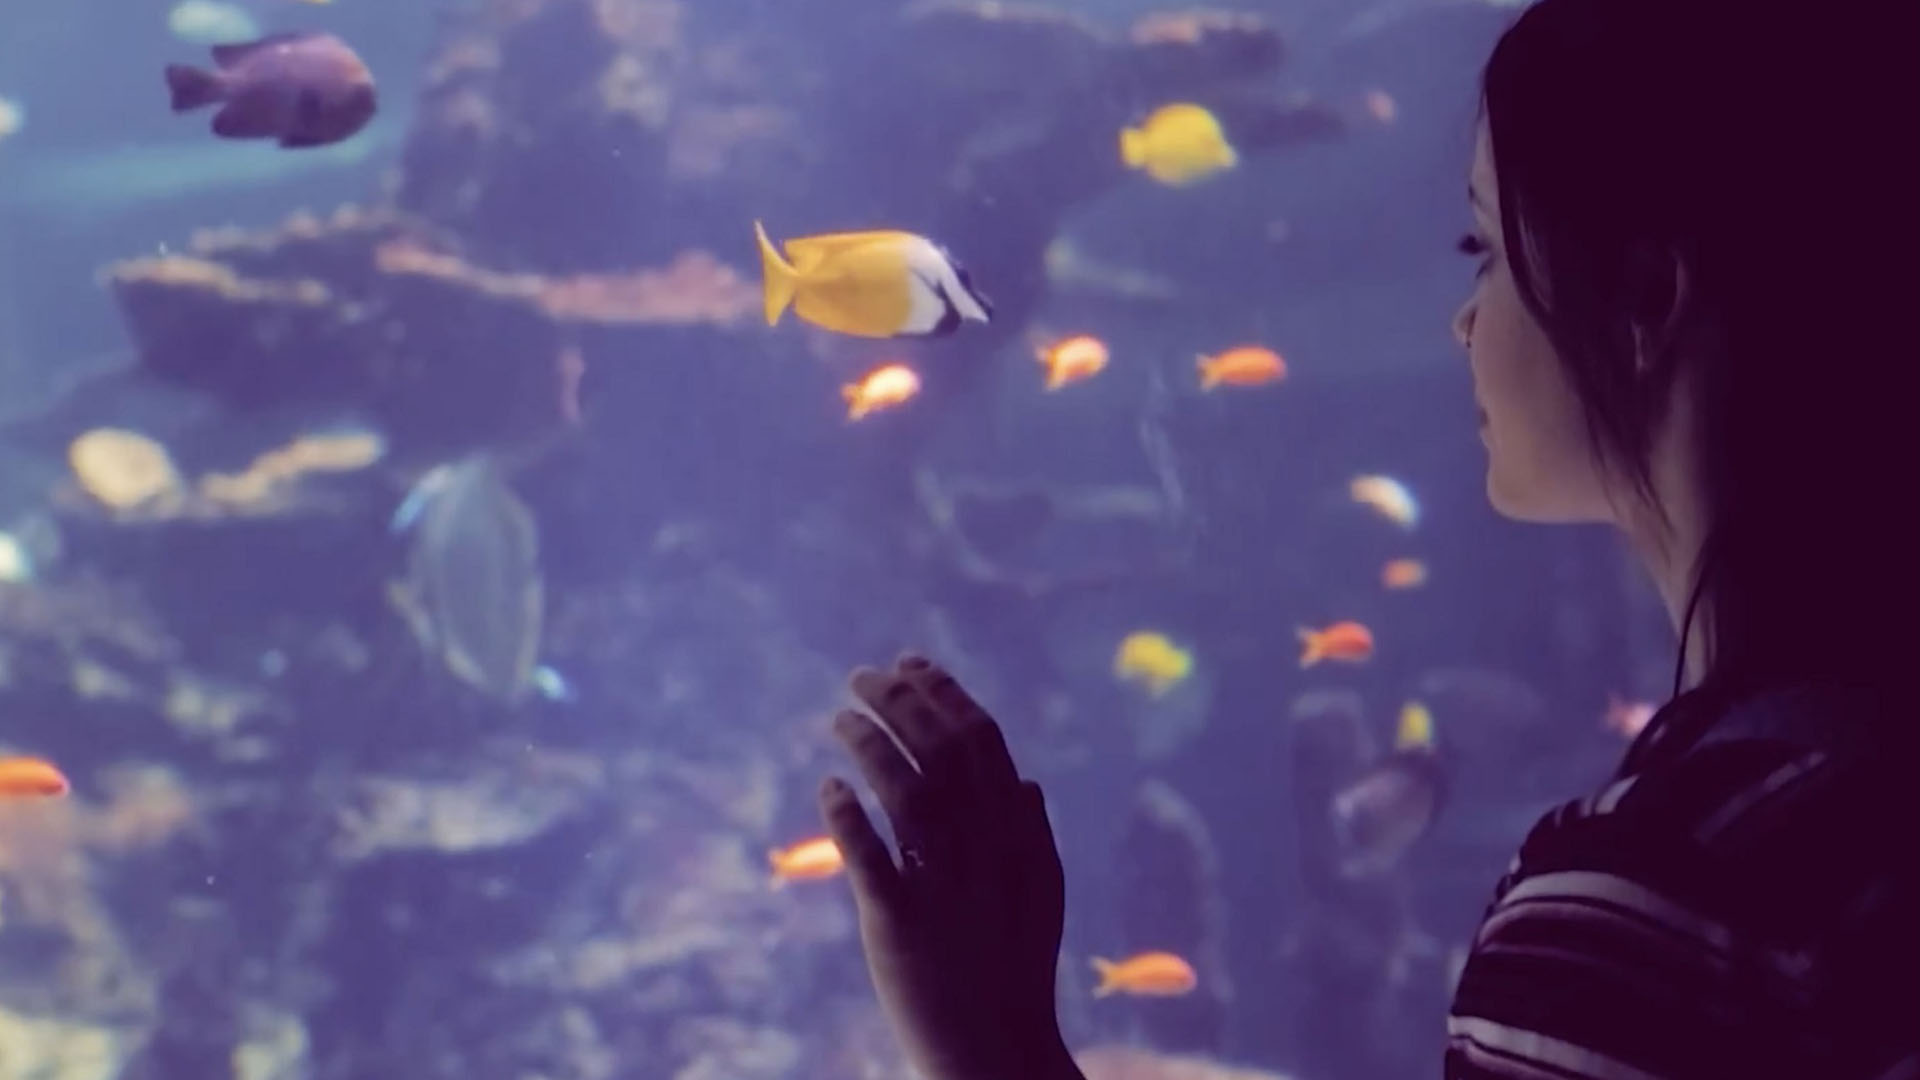 Close up of teenage girl's face looking at fish in aquarium